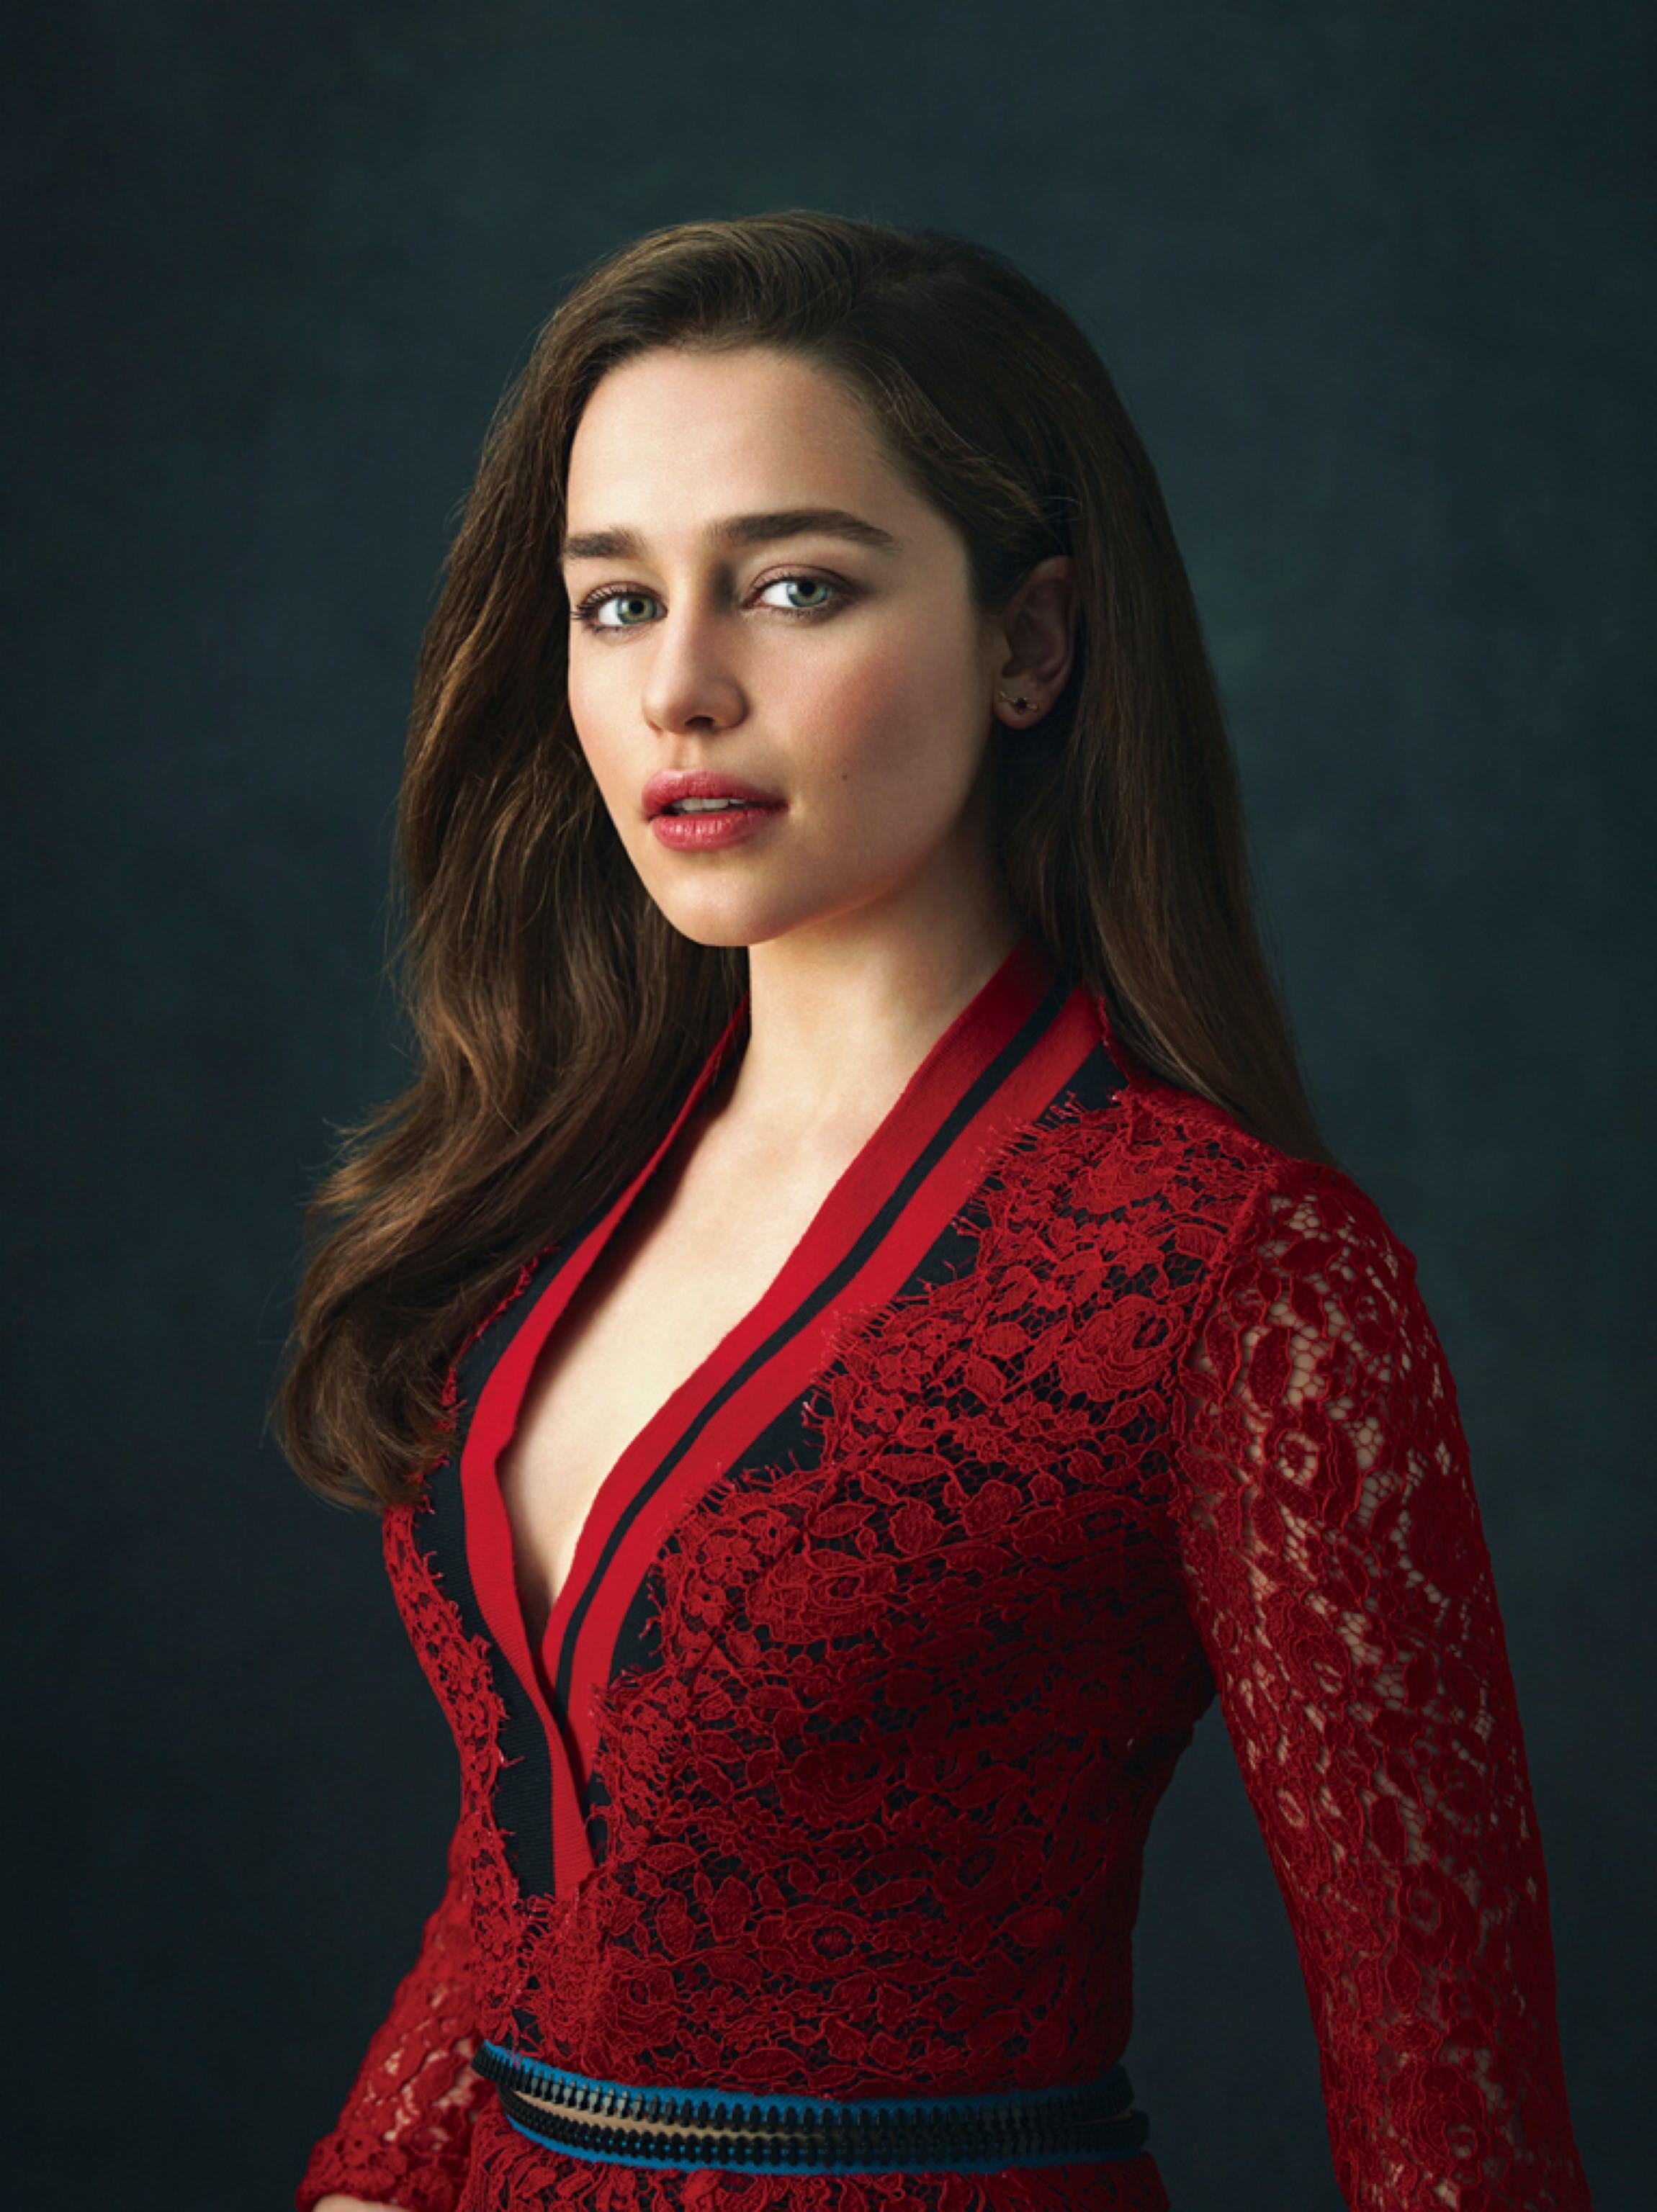 Wallpaper Celebrity Game Of Thrones Emilia Clarke Women